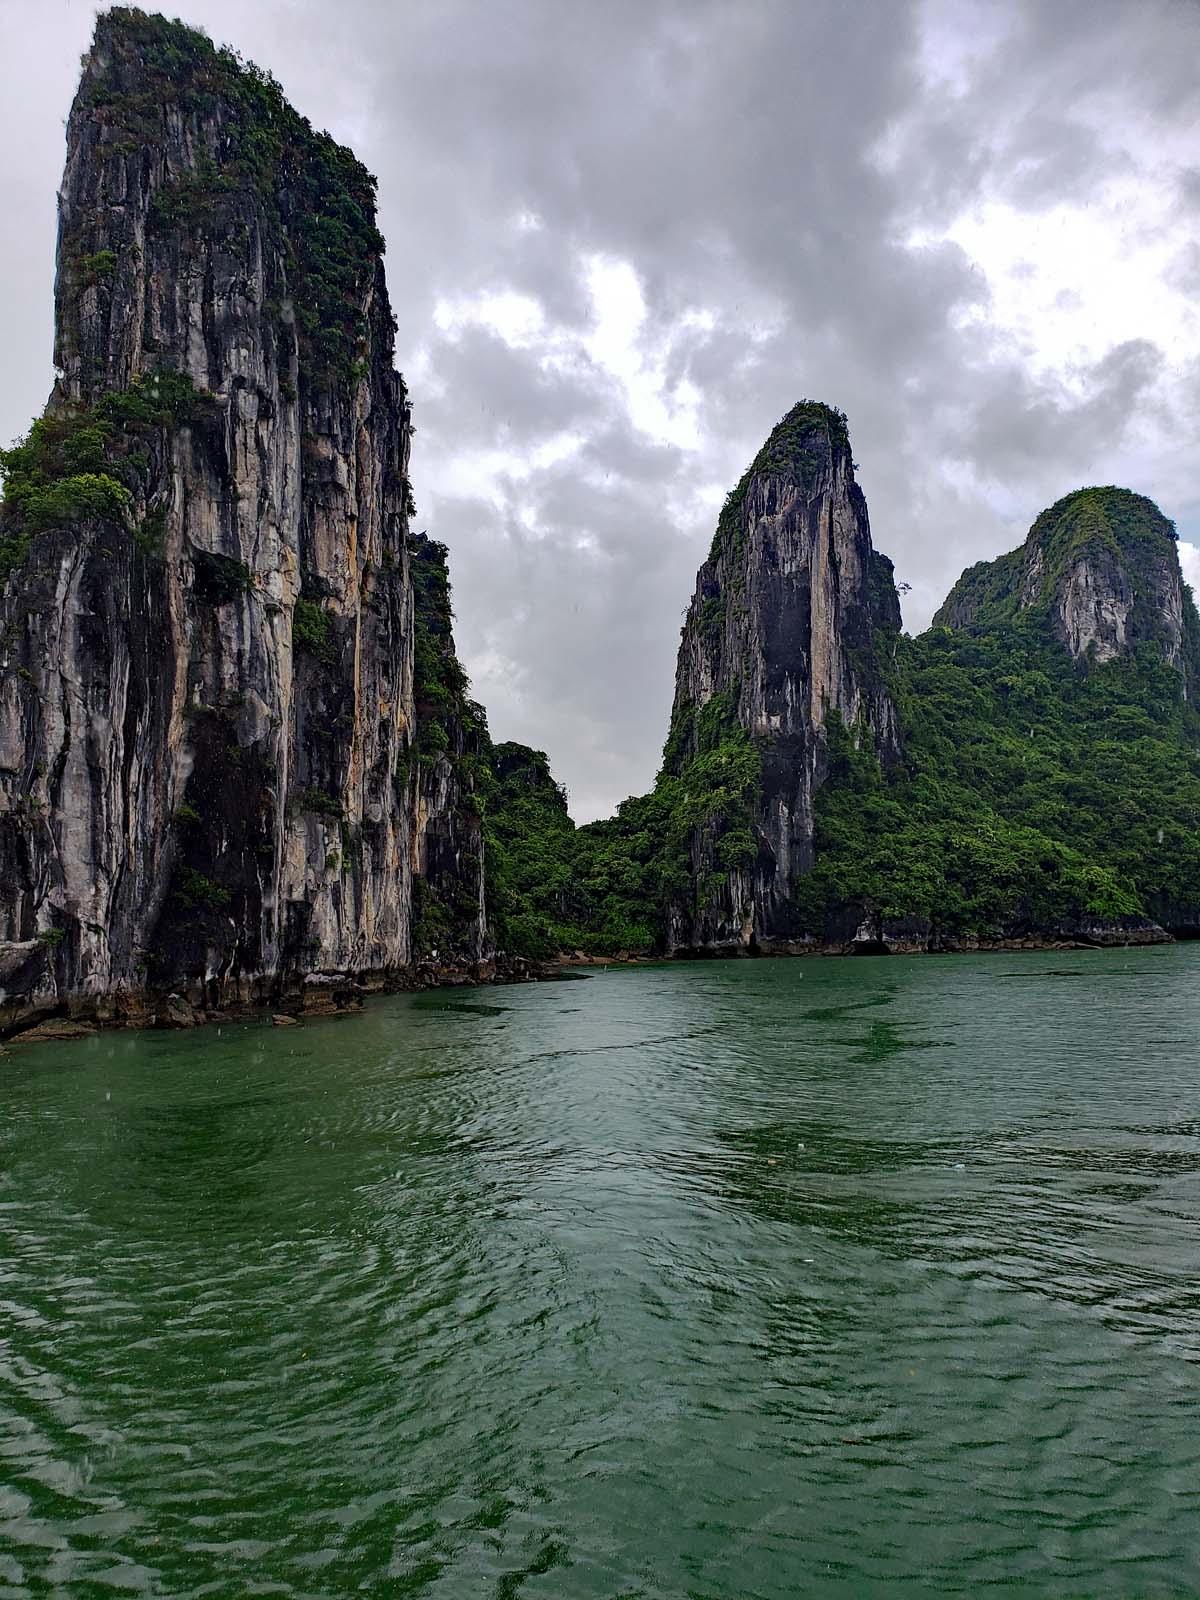 More limestone cliffs against dark rain filled clouds.